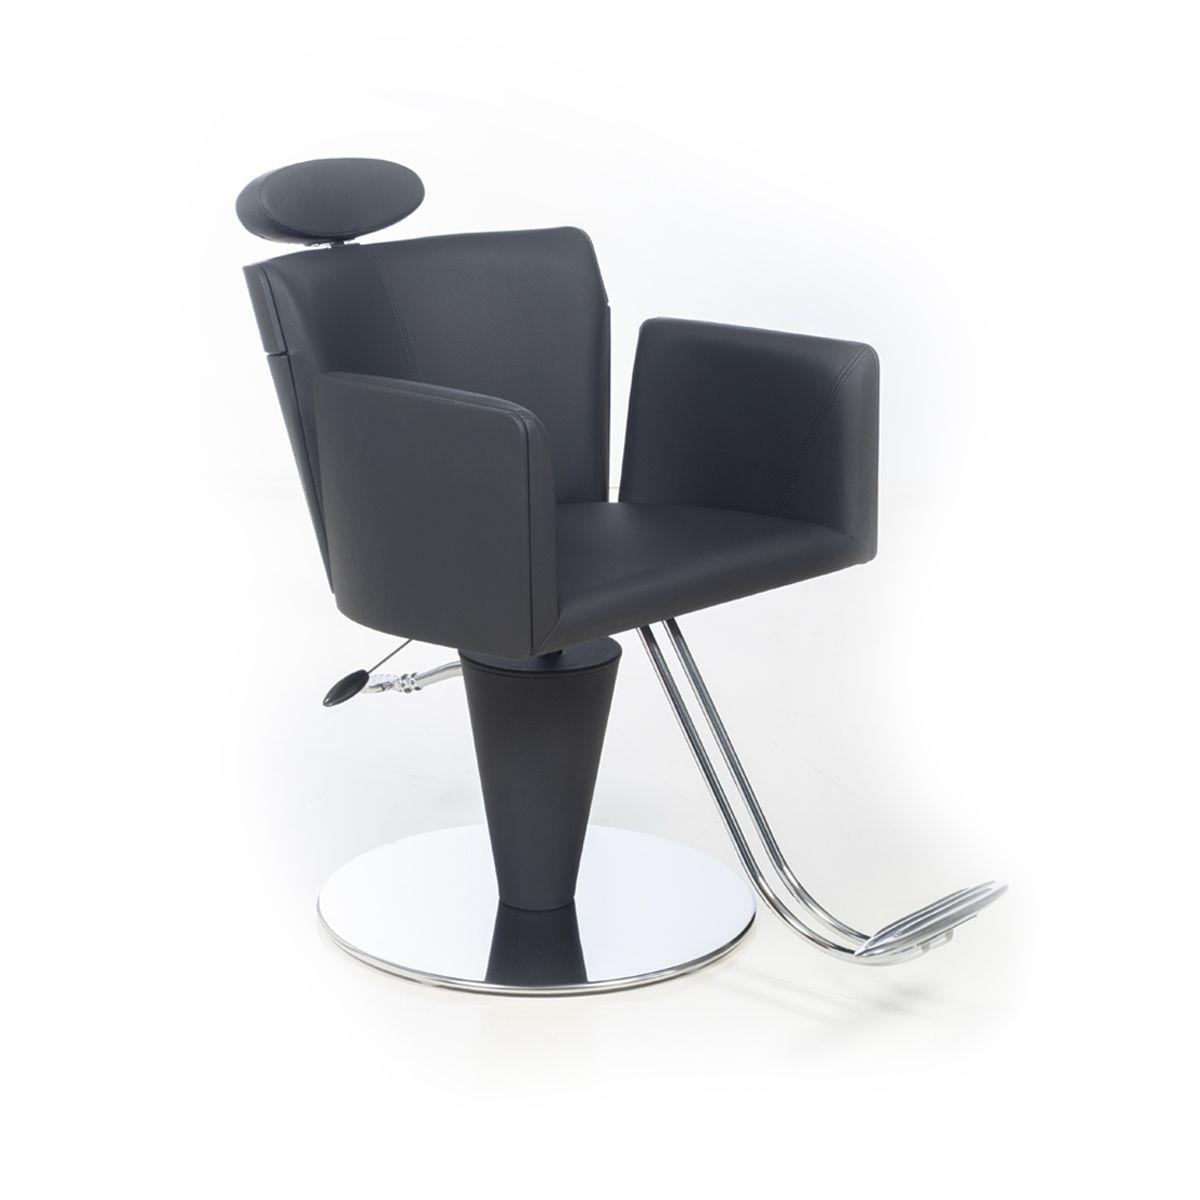 Wondrous Aida Make Up Aida Make Up Styling Salon Chairs Beauty Ibusinesslaw Wood Chair Design Ideas Ibusinesslaworg